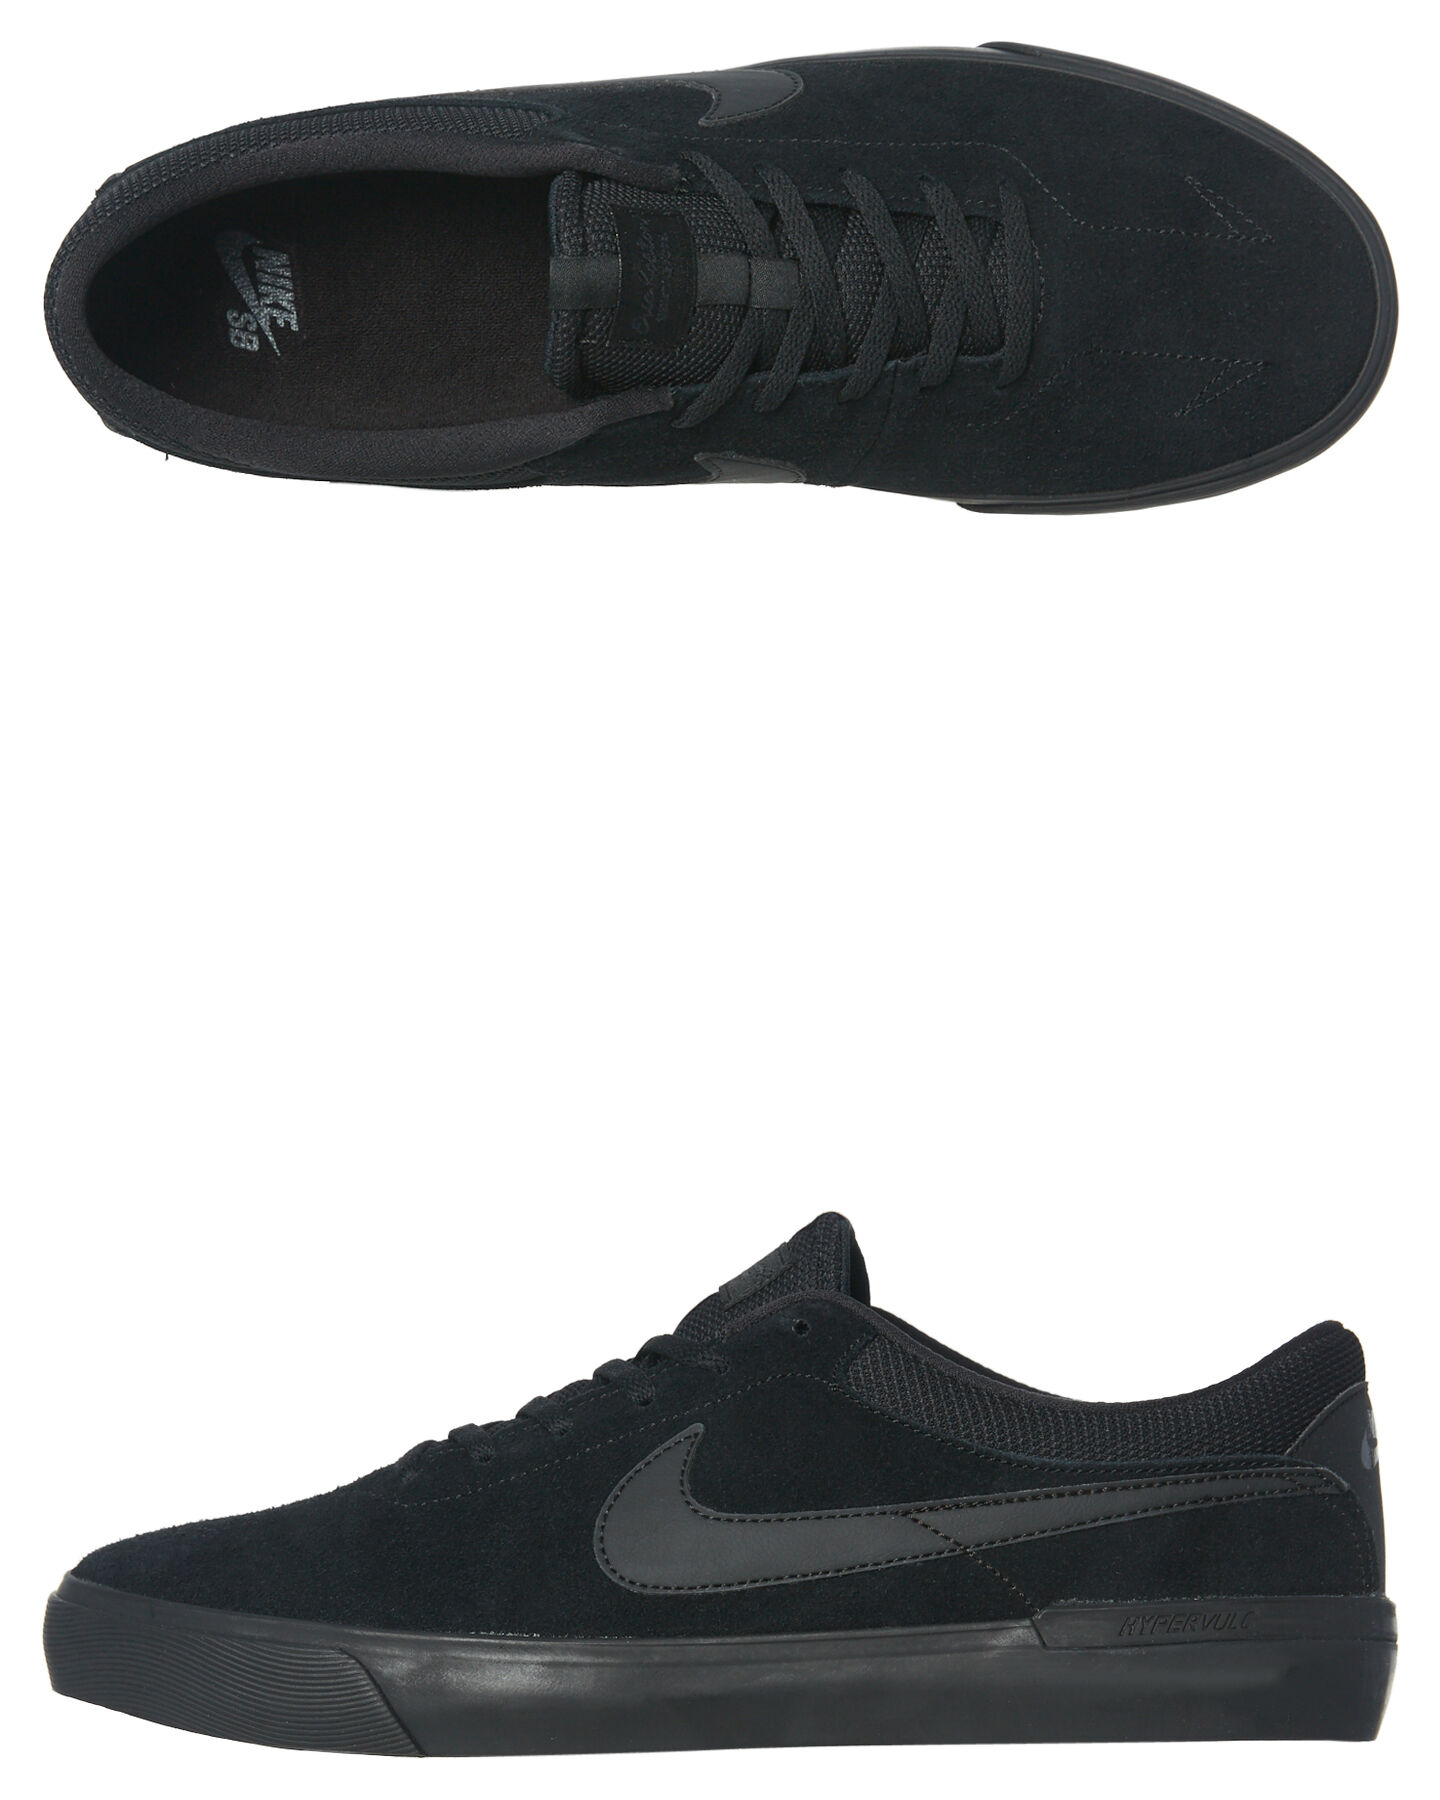 f2acc14e2476 ... amazon black black mens footwear nike skate shoes 844447 008 2bec4 fbe48